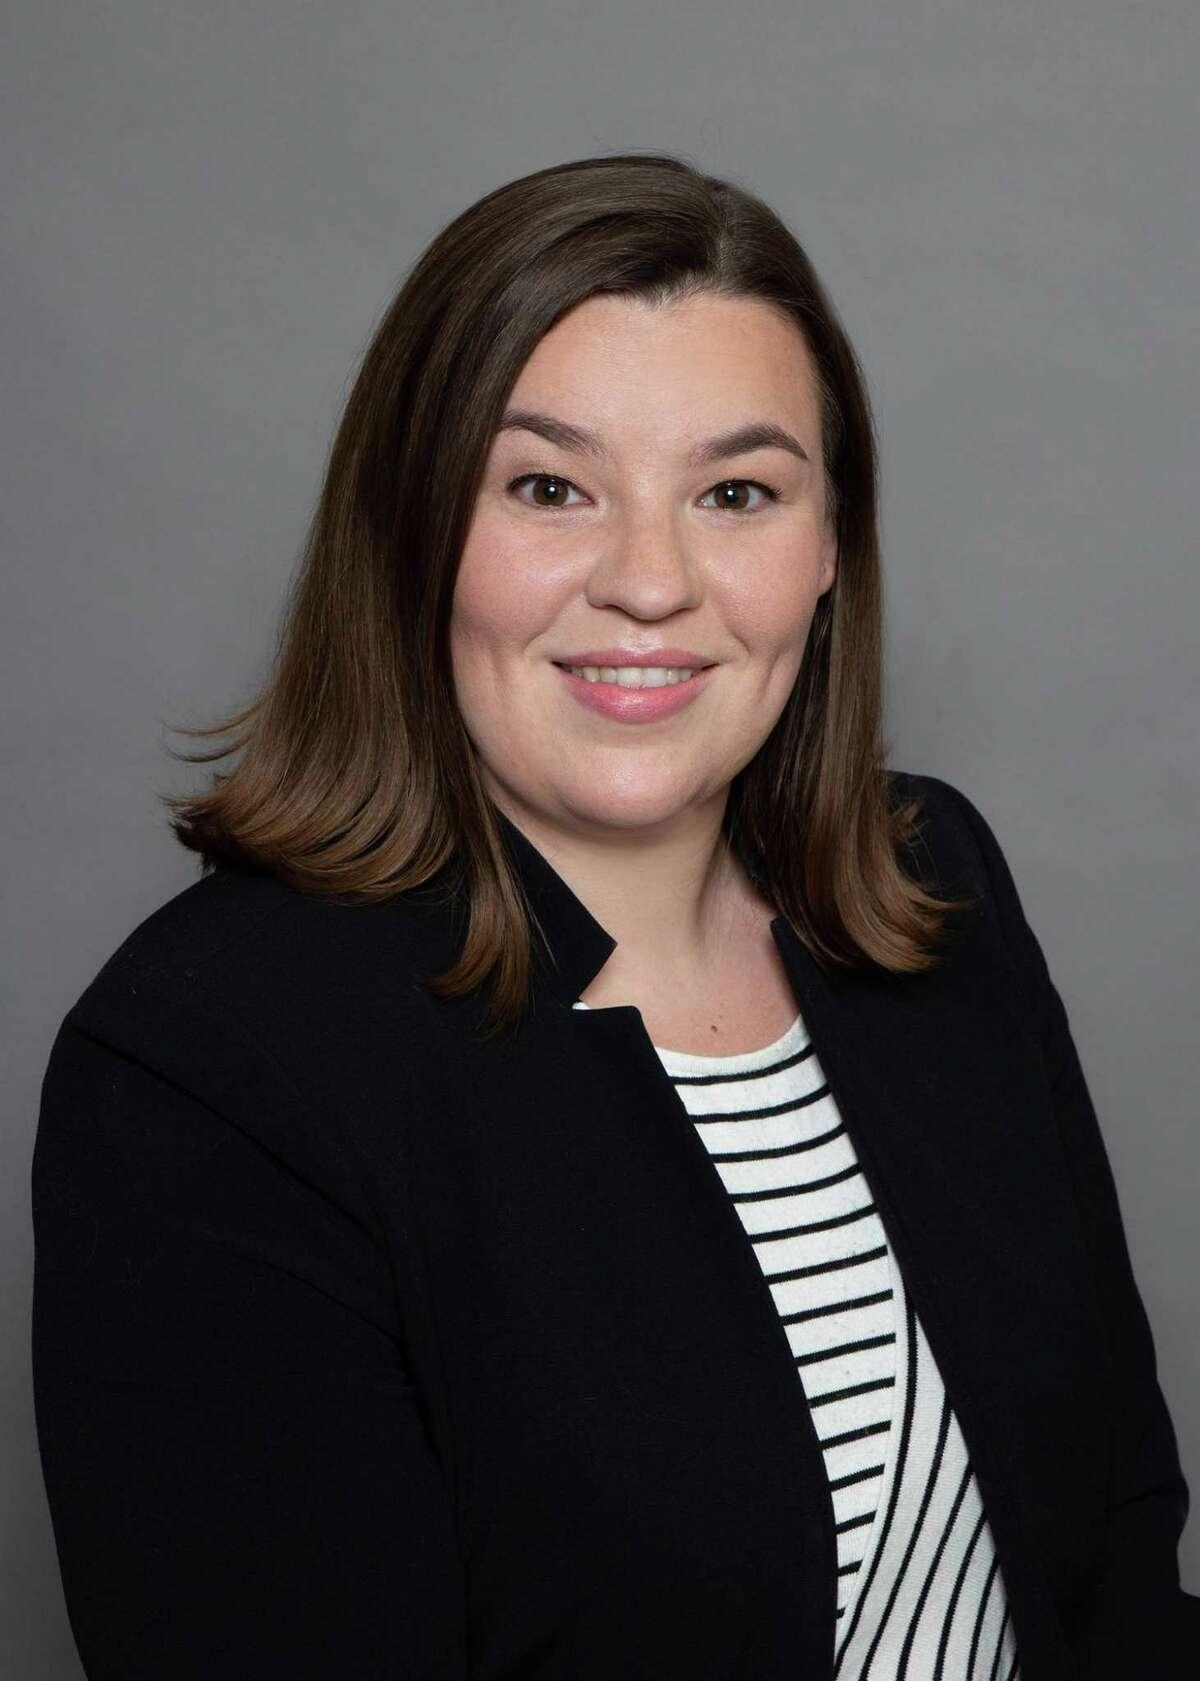 Jessie Dorné